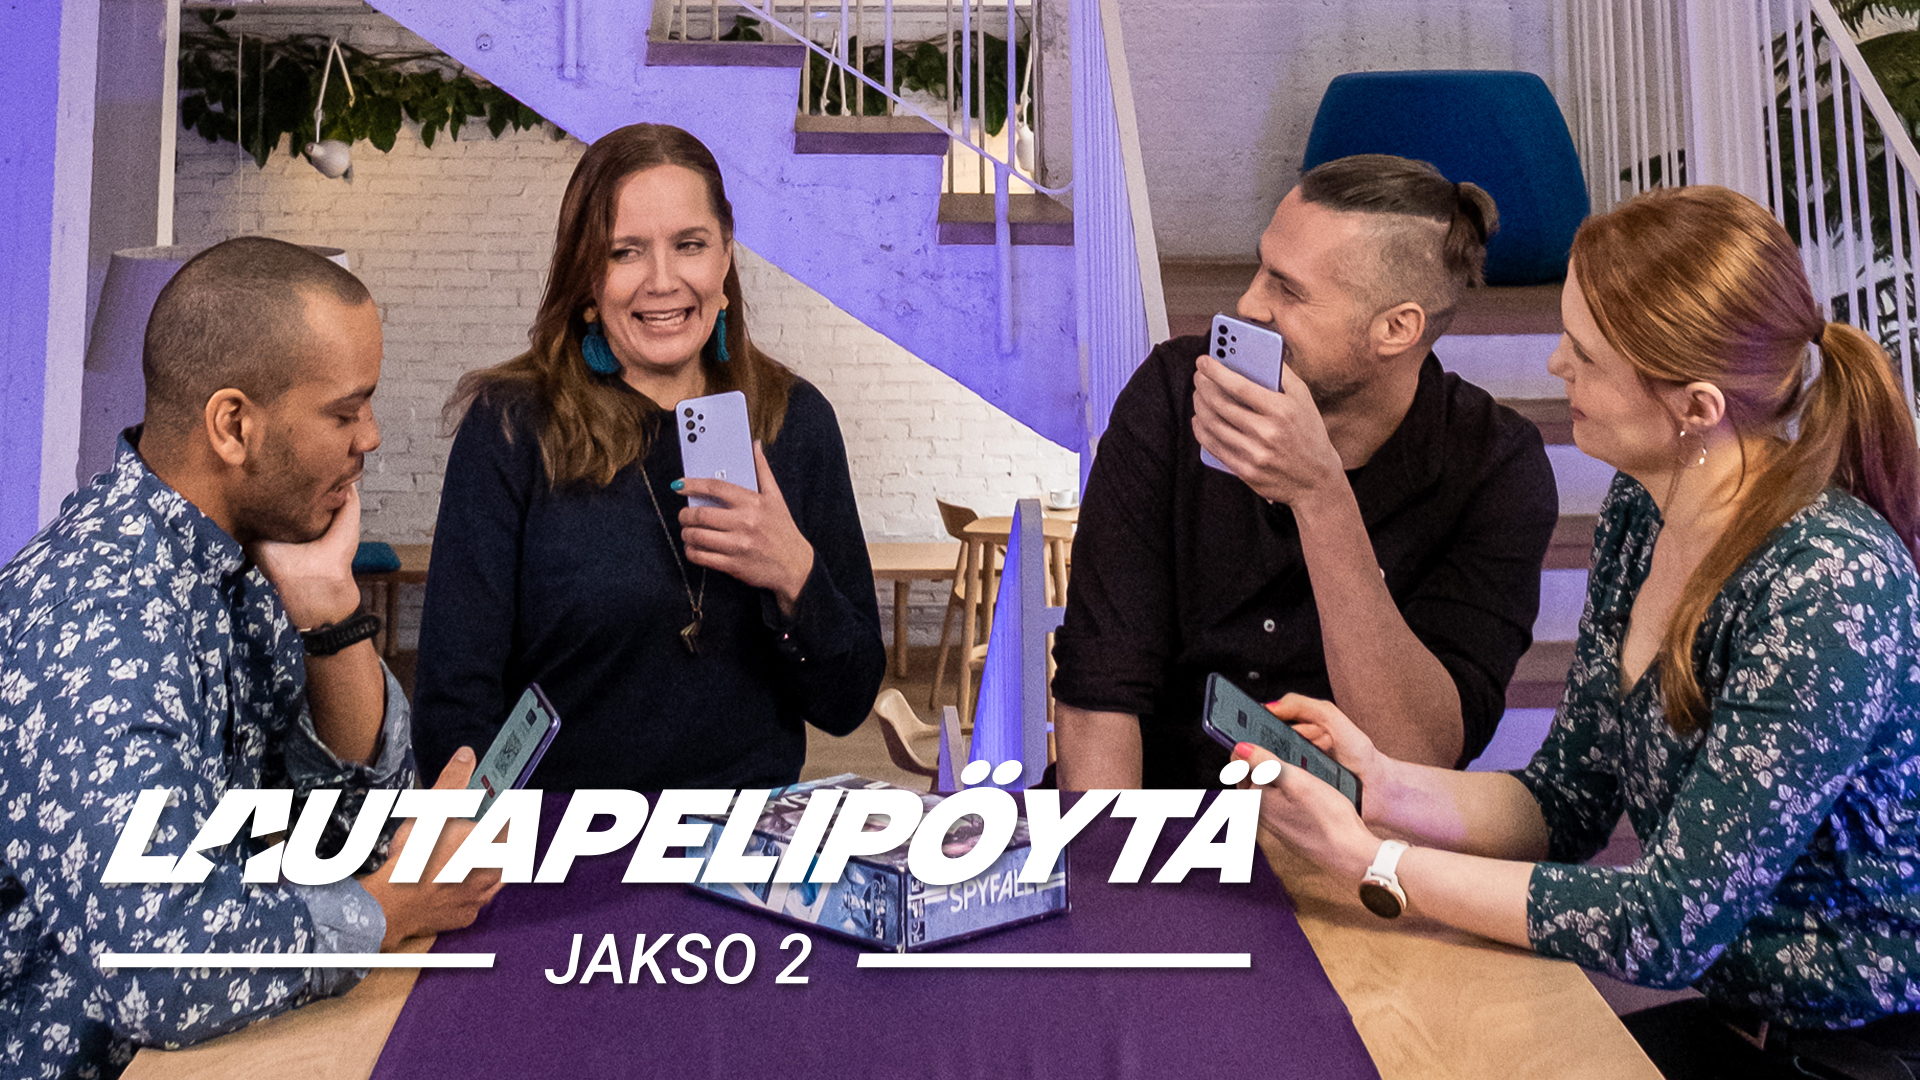 Lautapelipoyta Thumbnail jakso-2